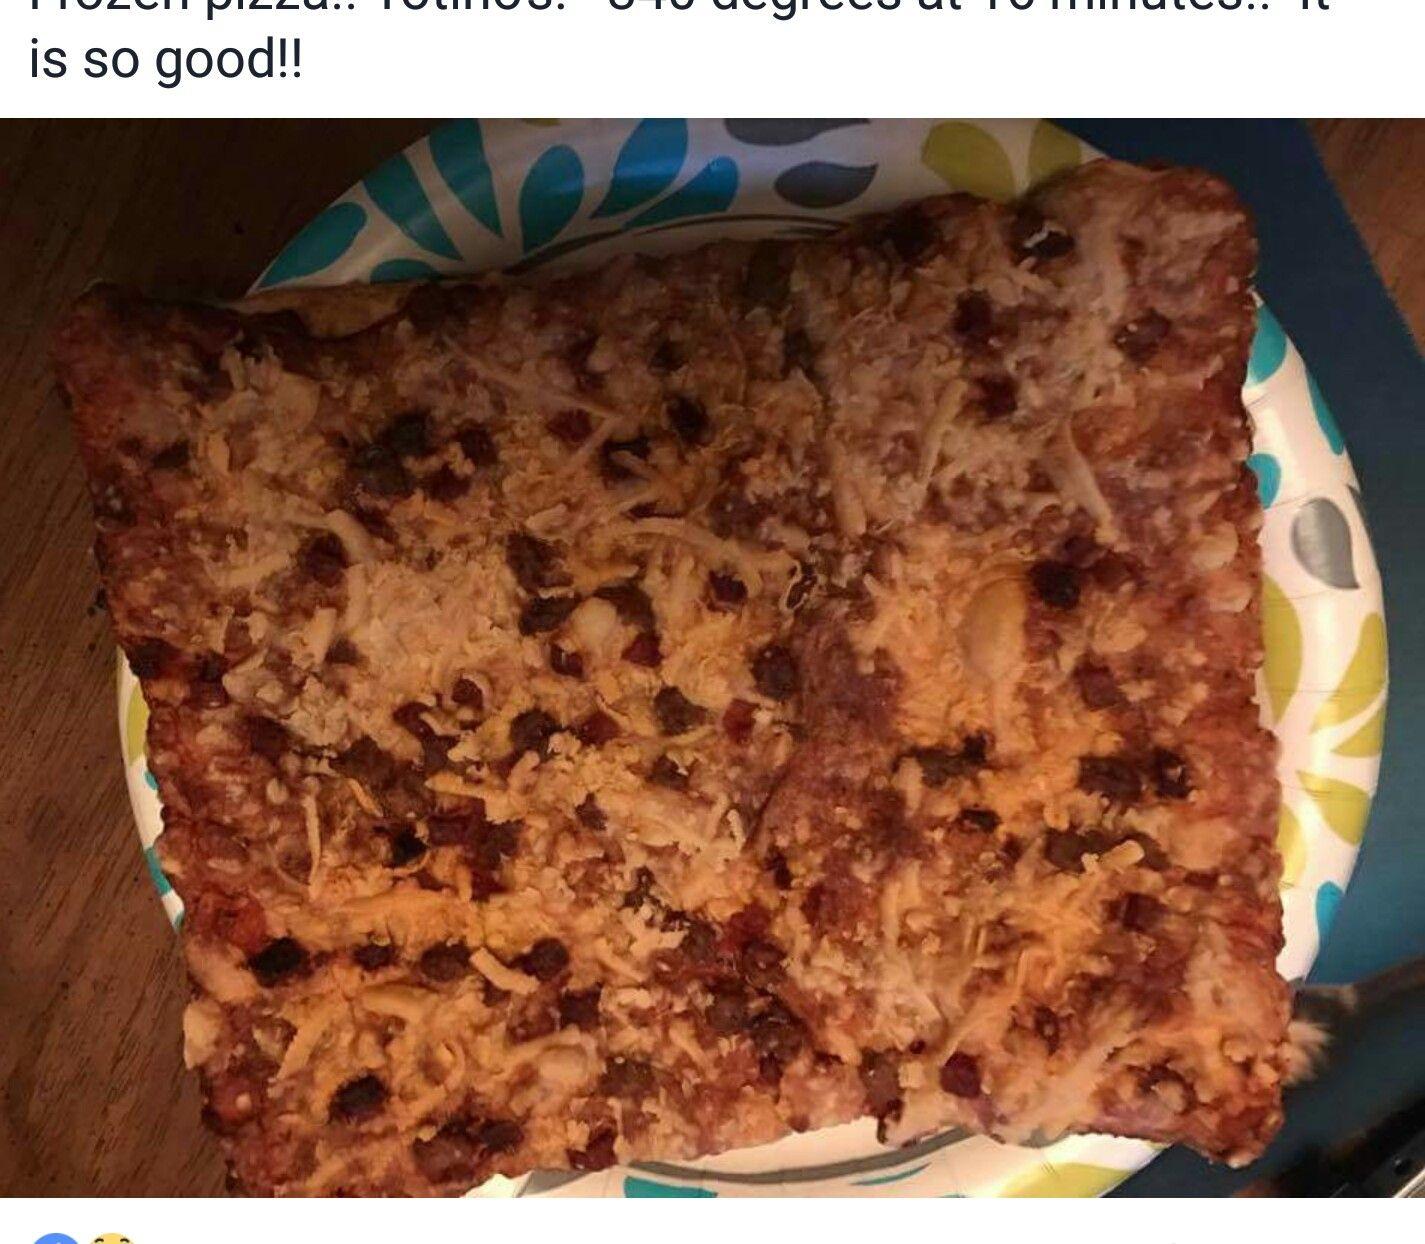 Frozen totinos pizza Air fryer recipes, Recipes, Food